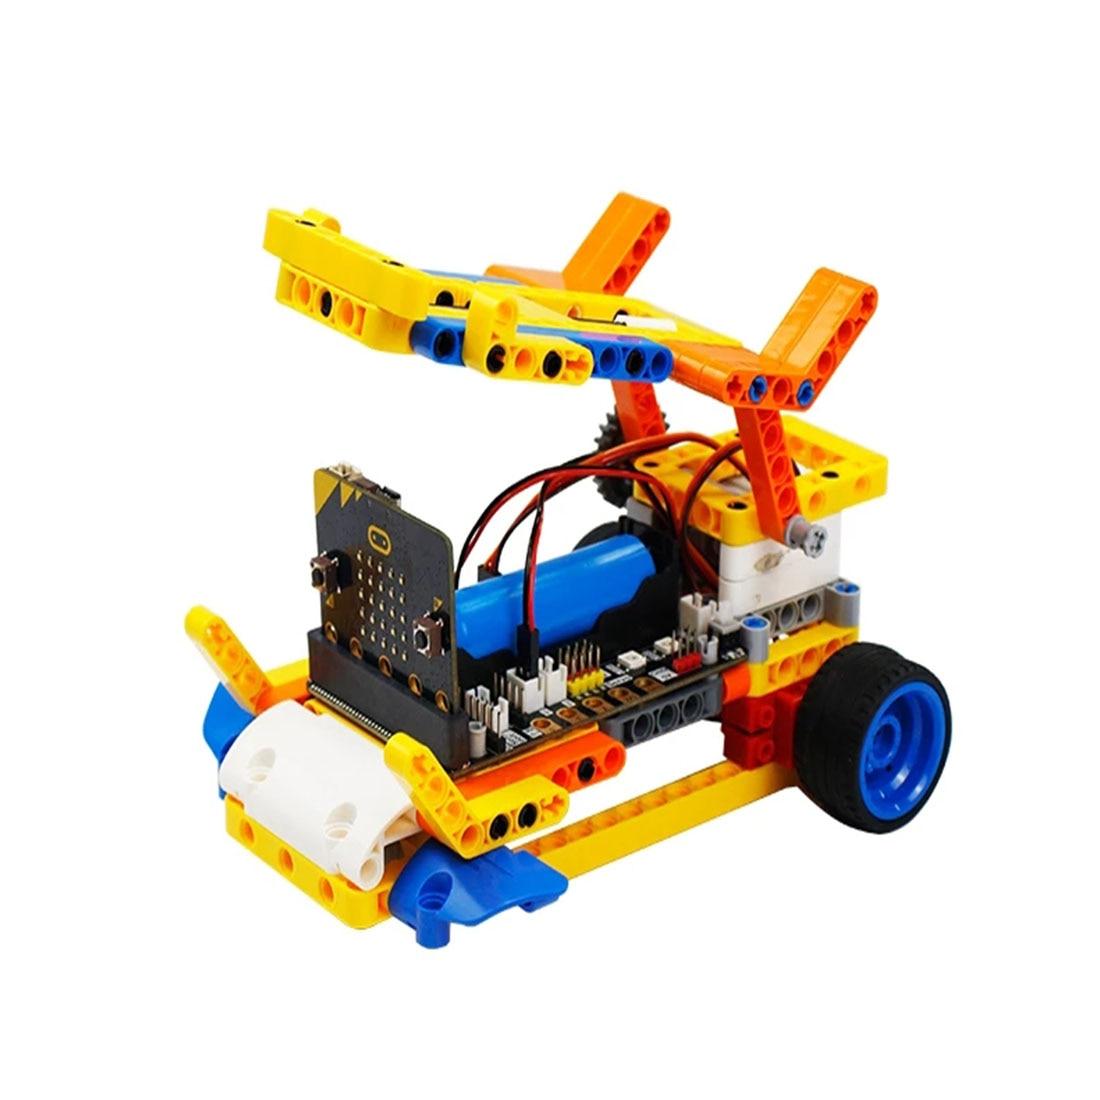 Program Intelligent Robot Building Block Car Kit Various Shapes Steam Programming Education Car For Micro:Bit Programable Toys